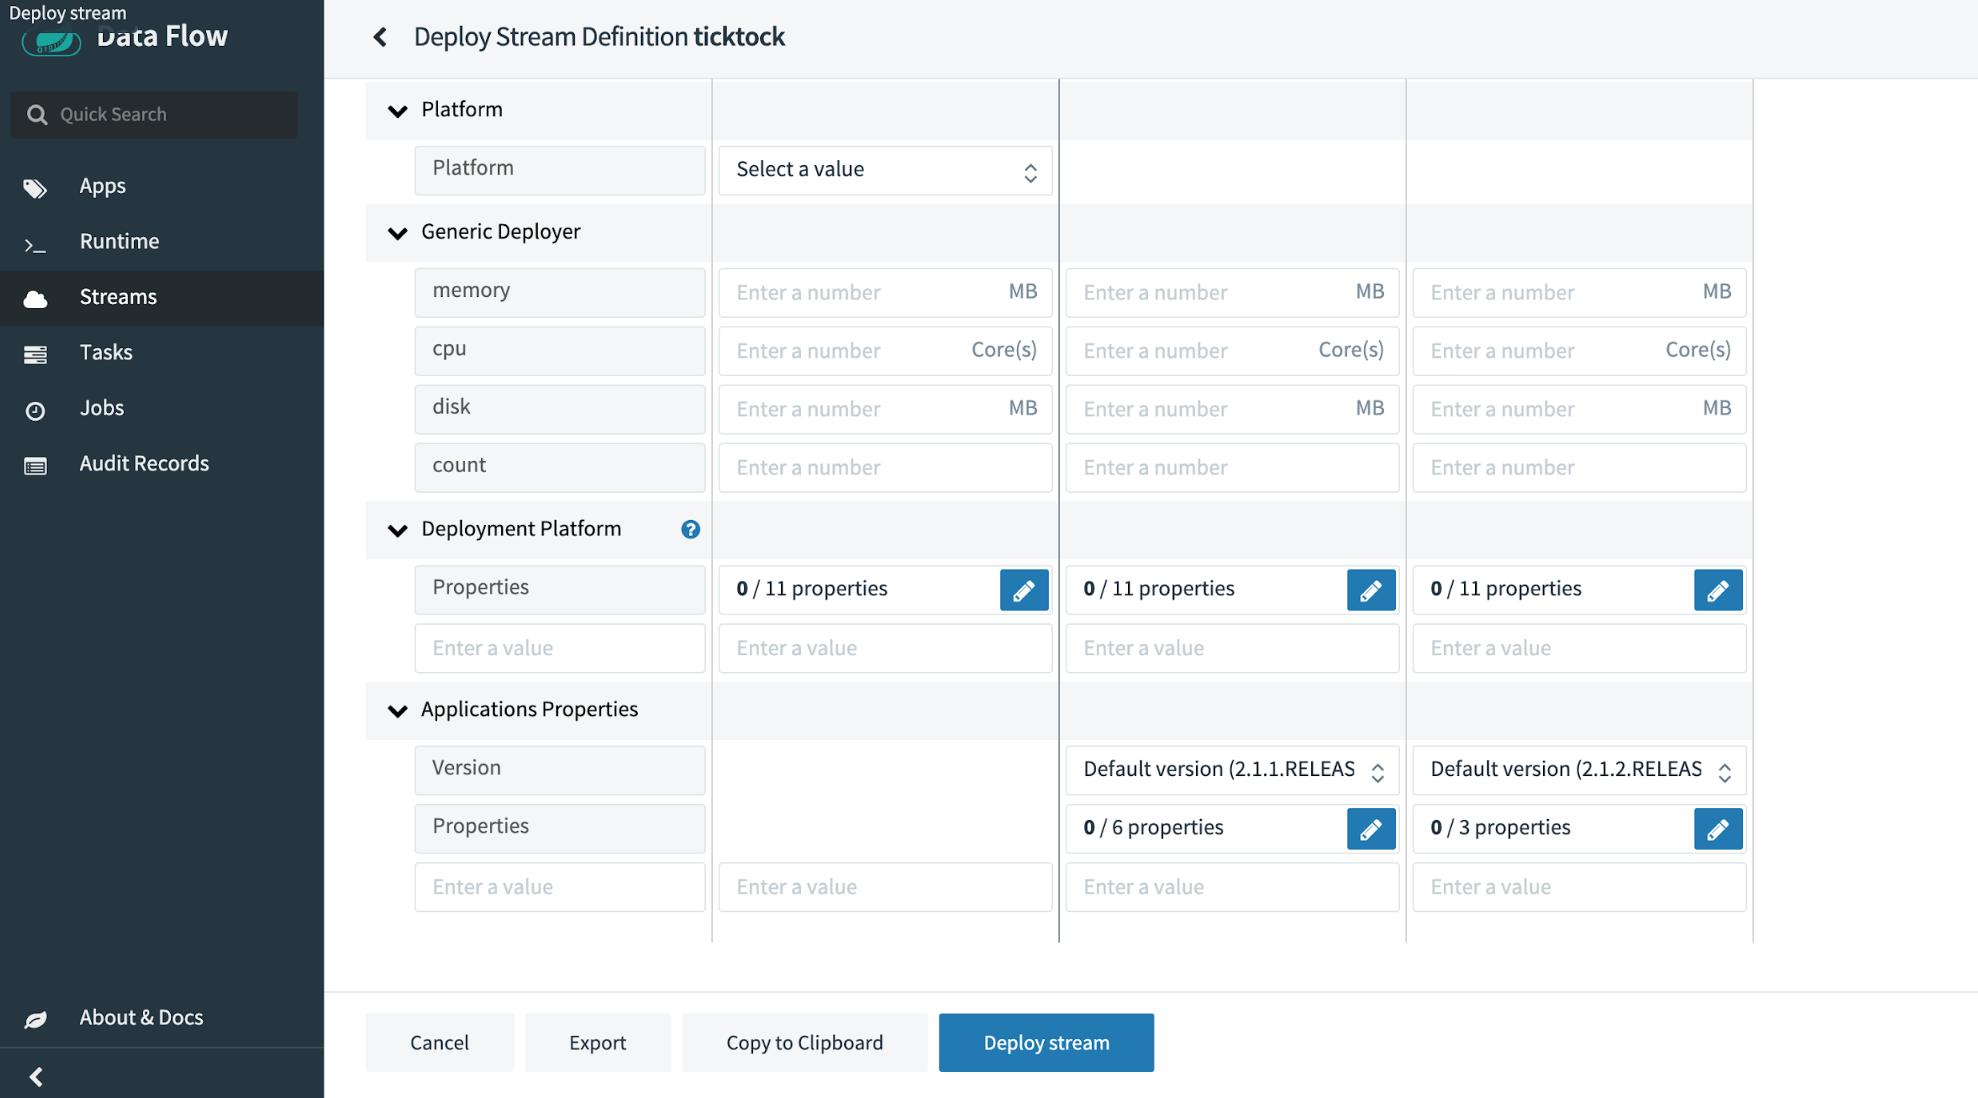 Data Flow   Deploy Stream Definition ticktock